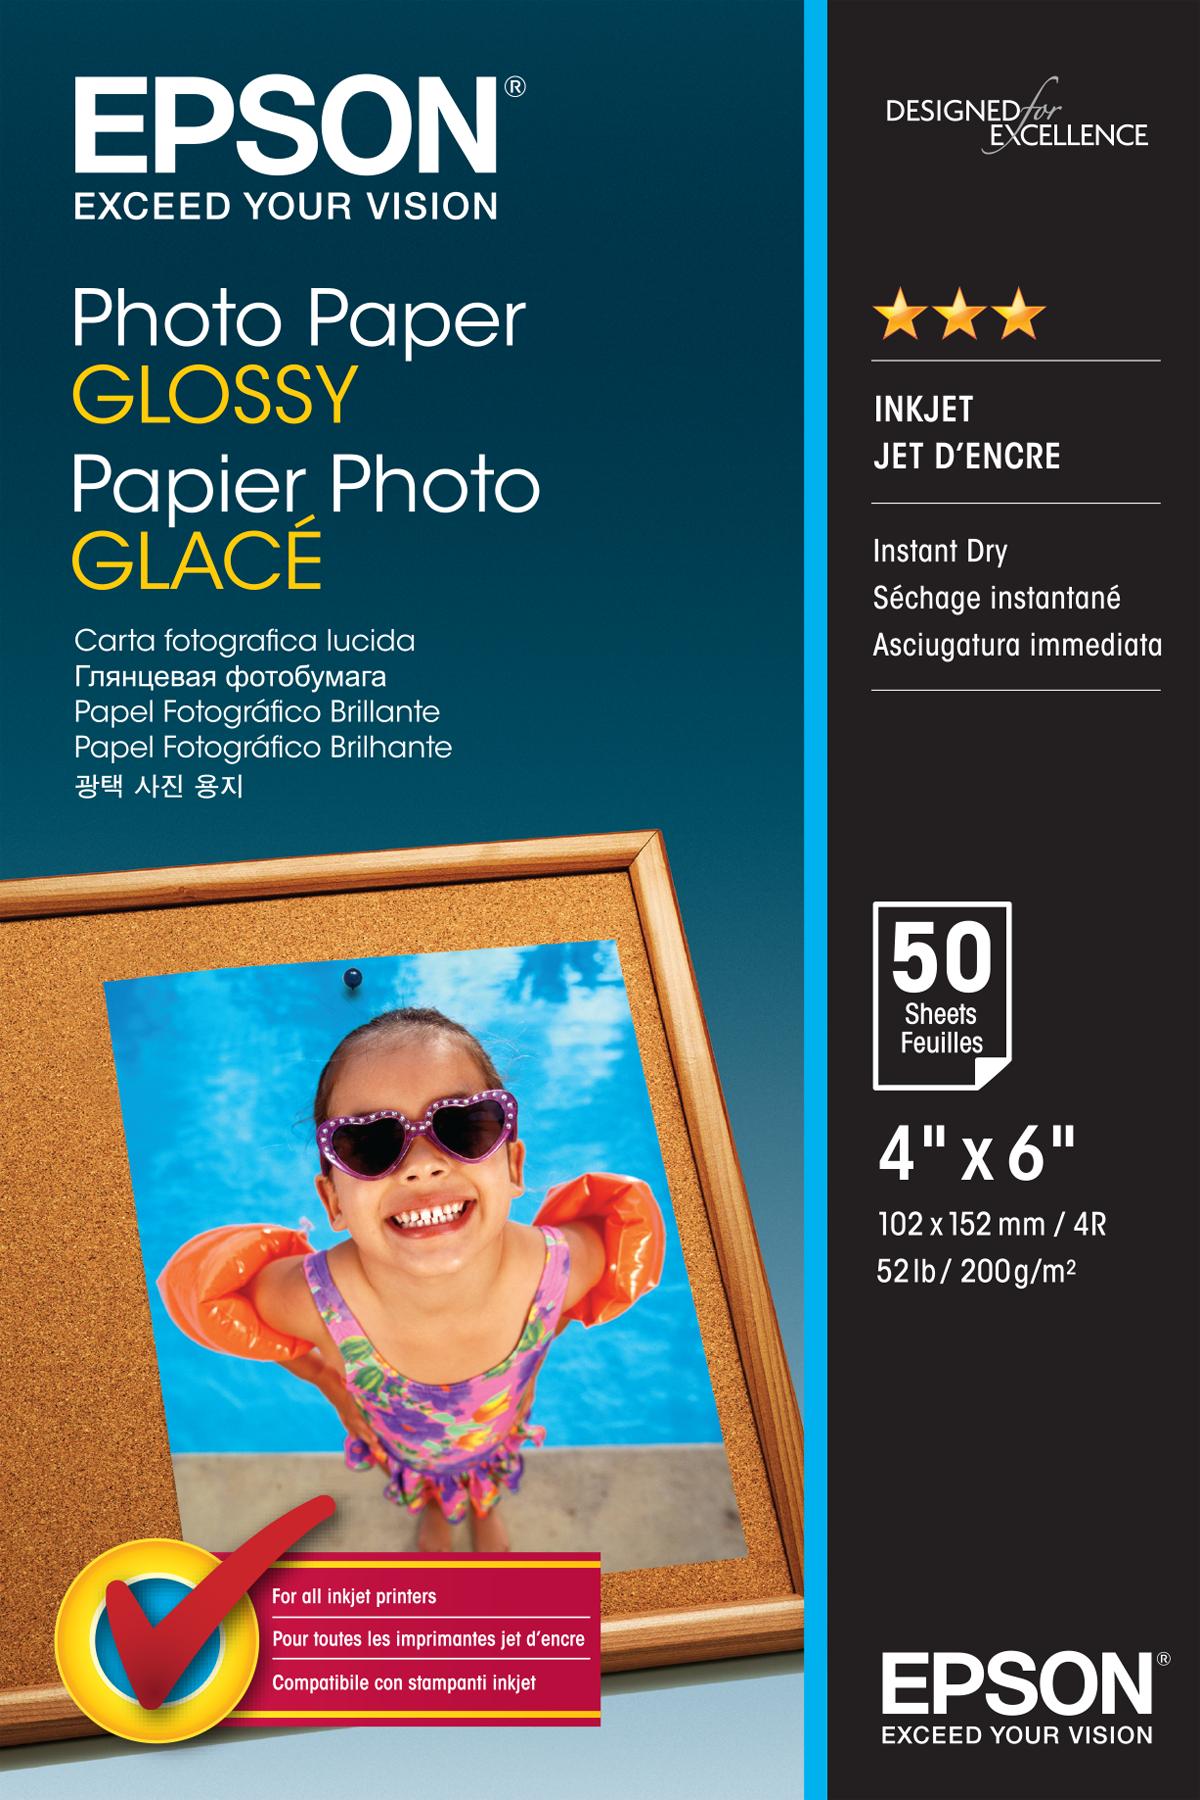 Epson C13S042547|Photo Paper Glossy 10x15 (4x6